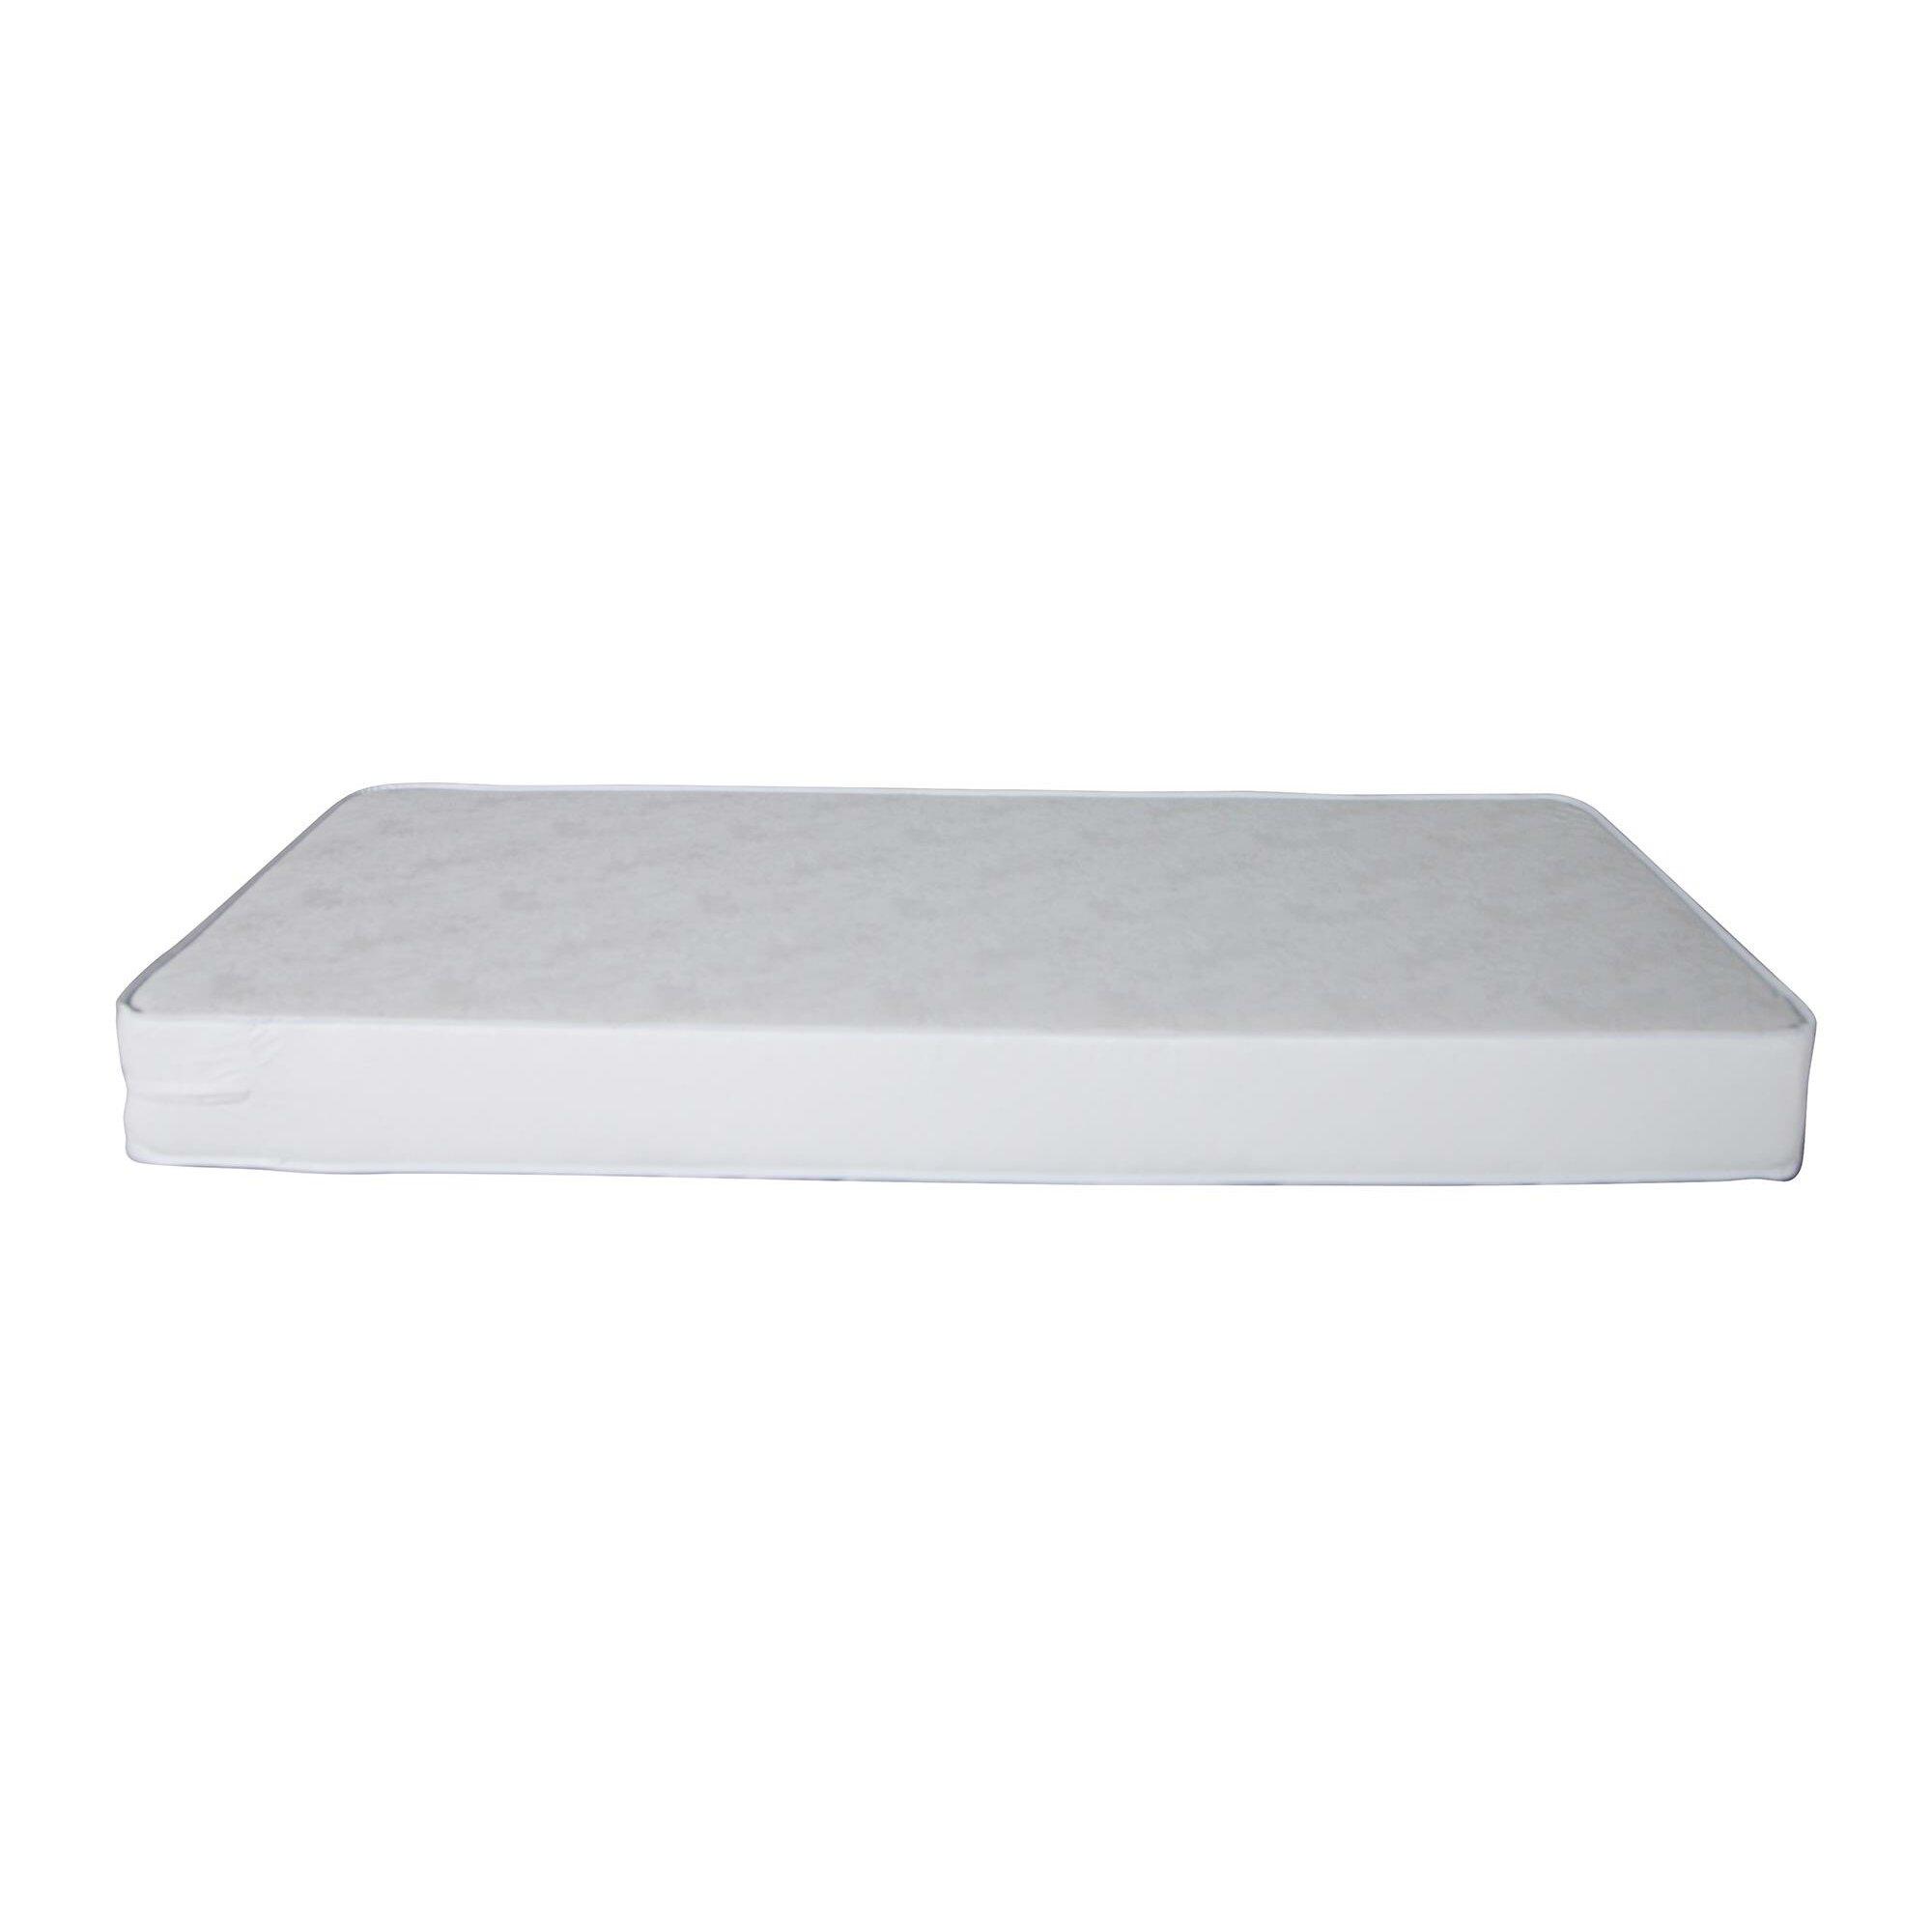 Crib mattress - Viv Rae Trade Abbott Safety 1st 5 5 Quot